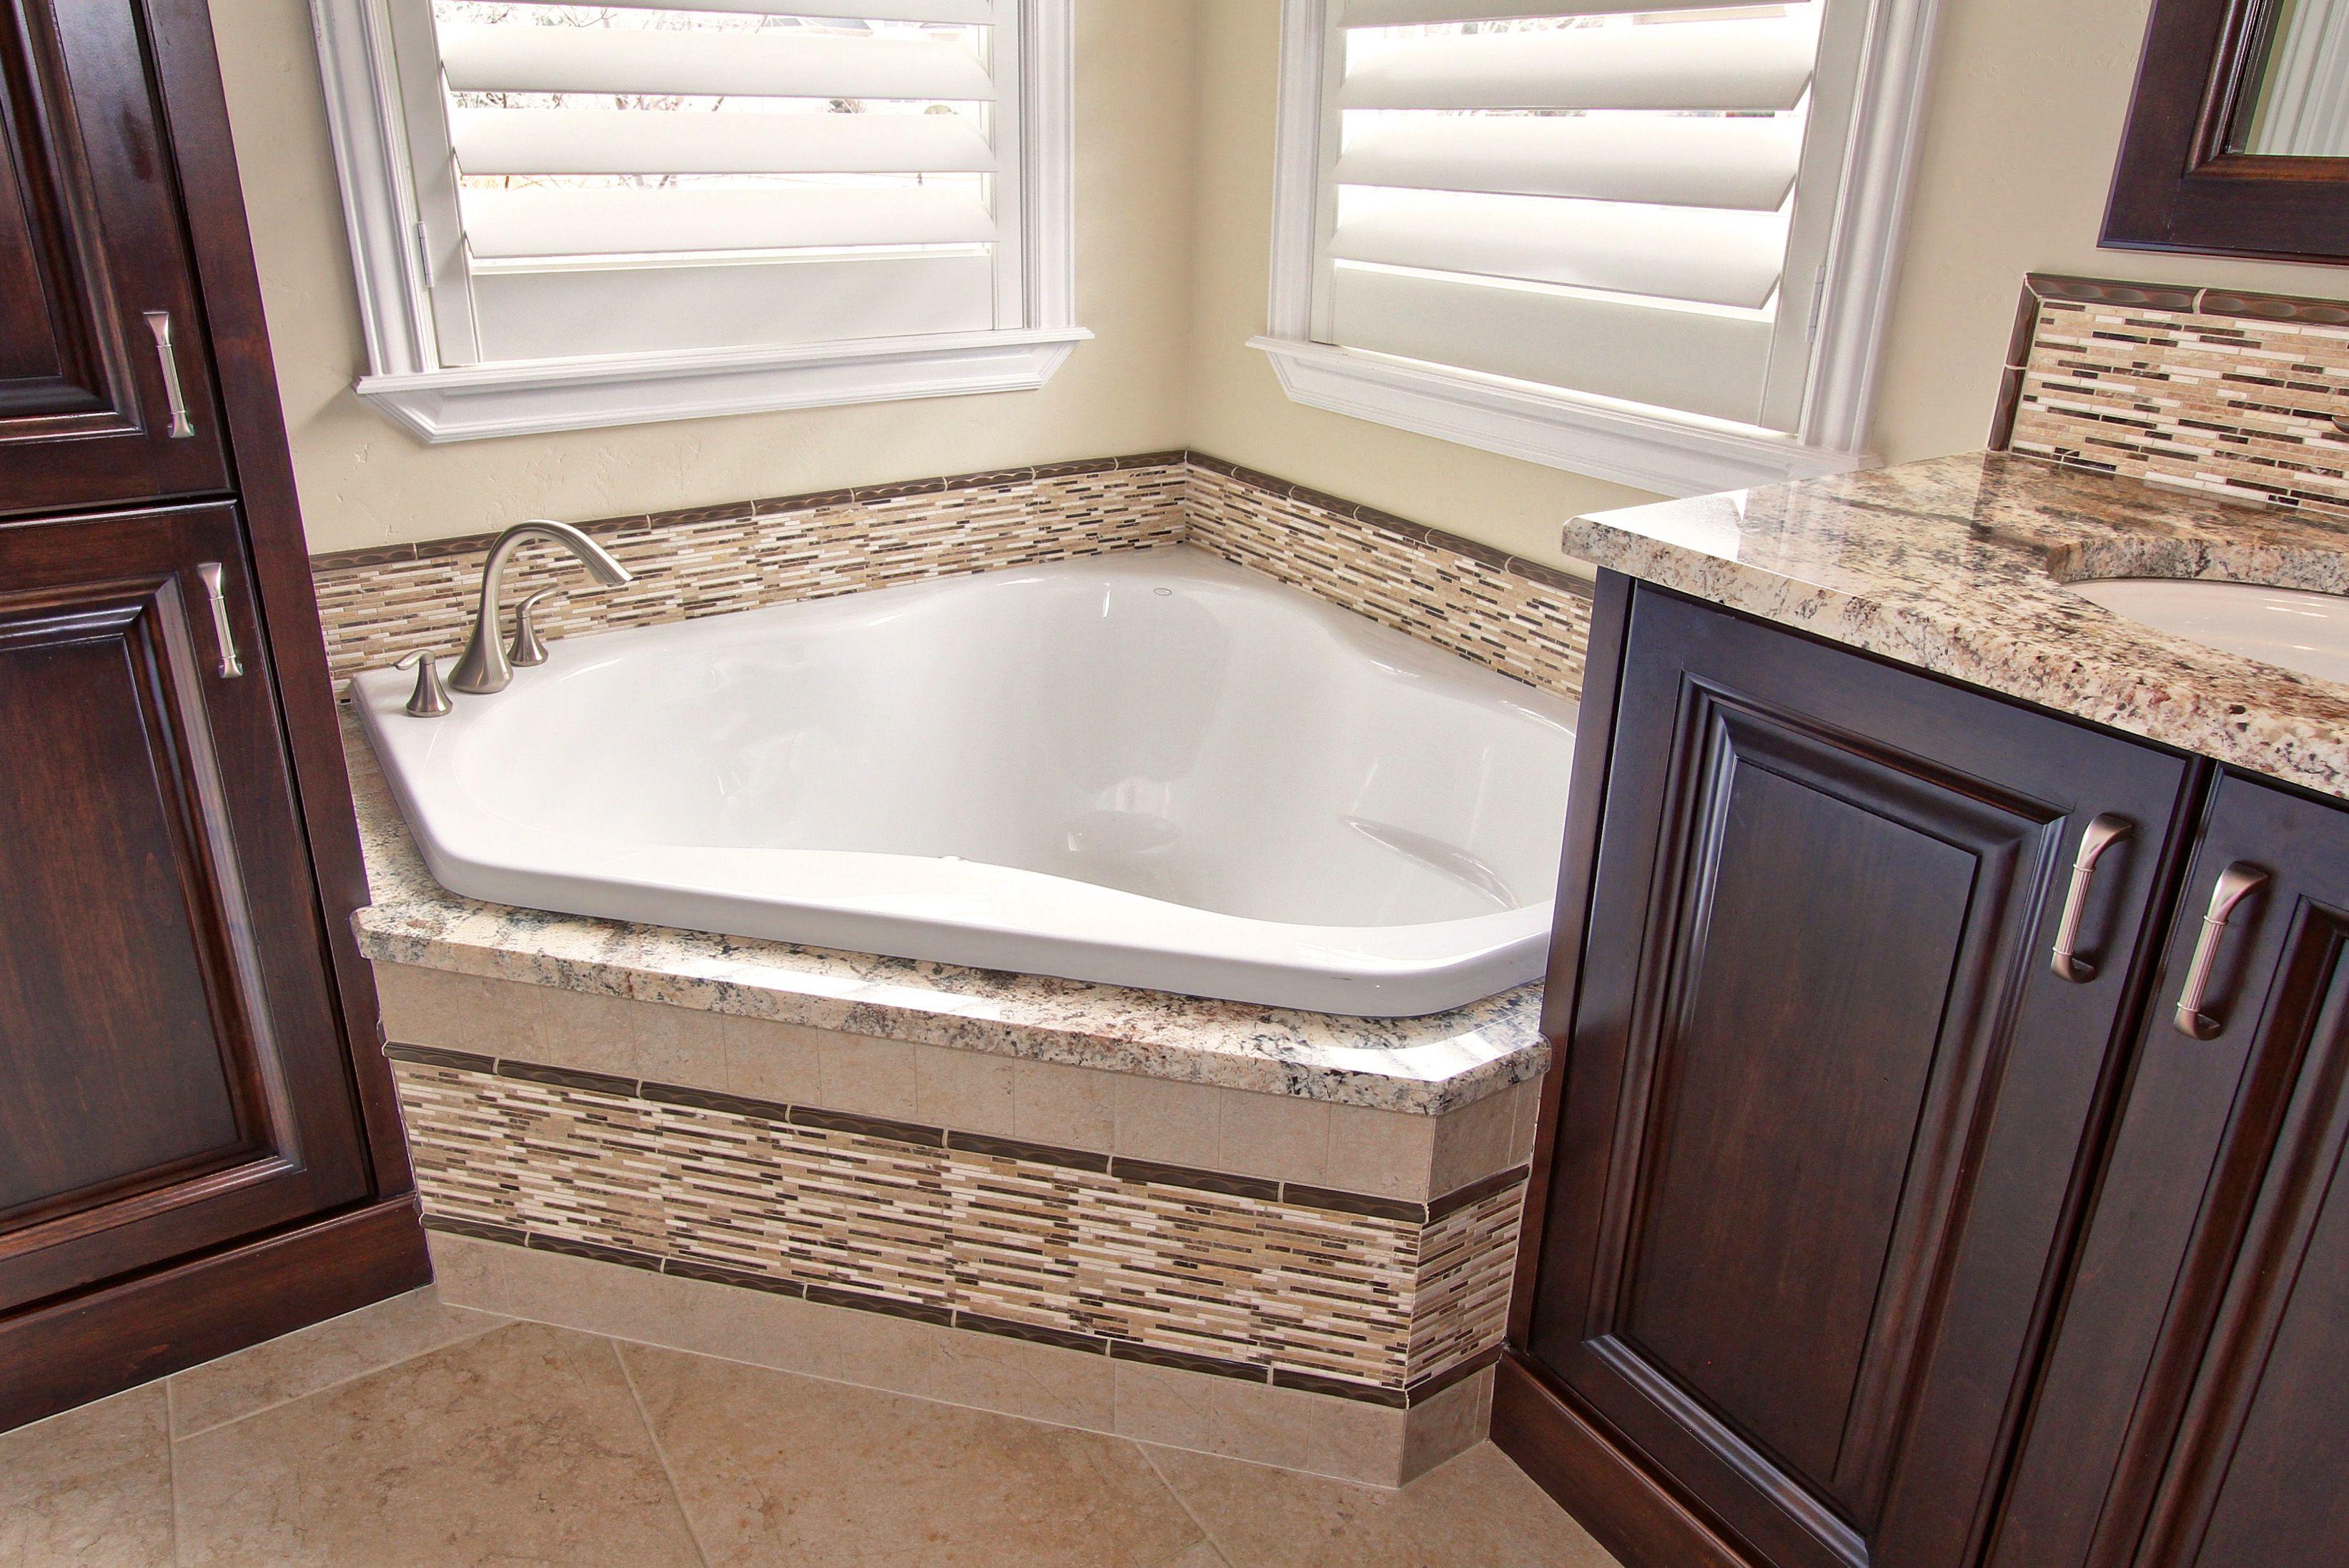 - Close Up Of The Tub #tub #bathroom #tile #traditional #gardentub